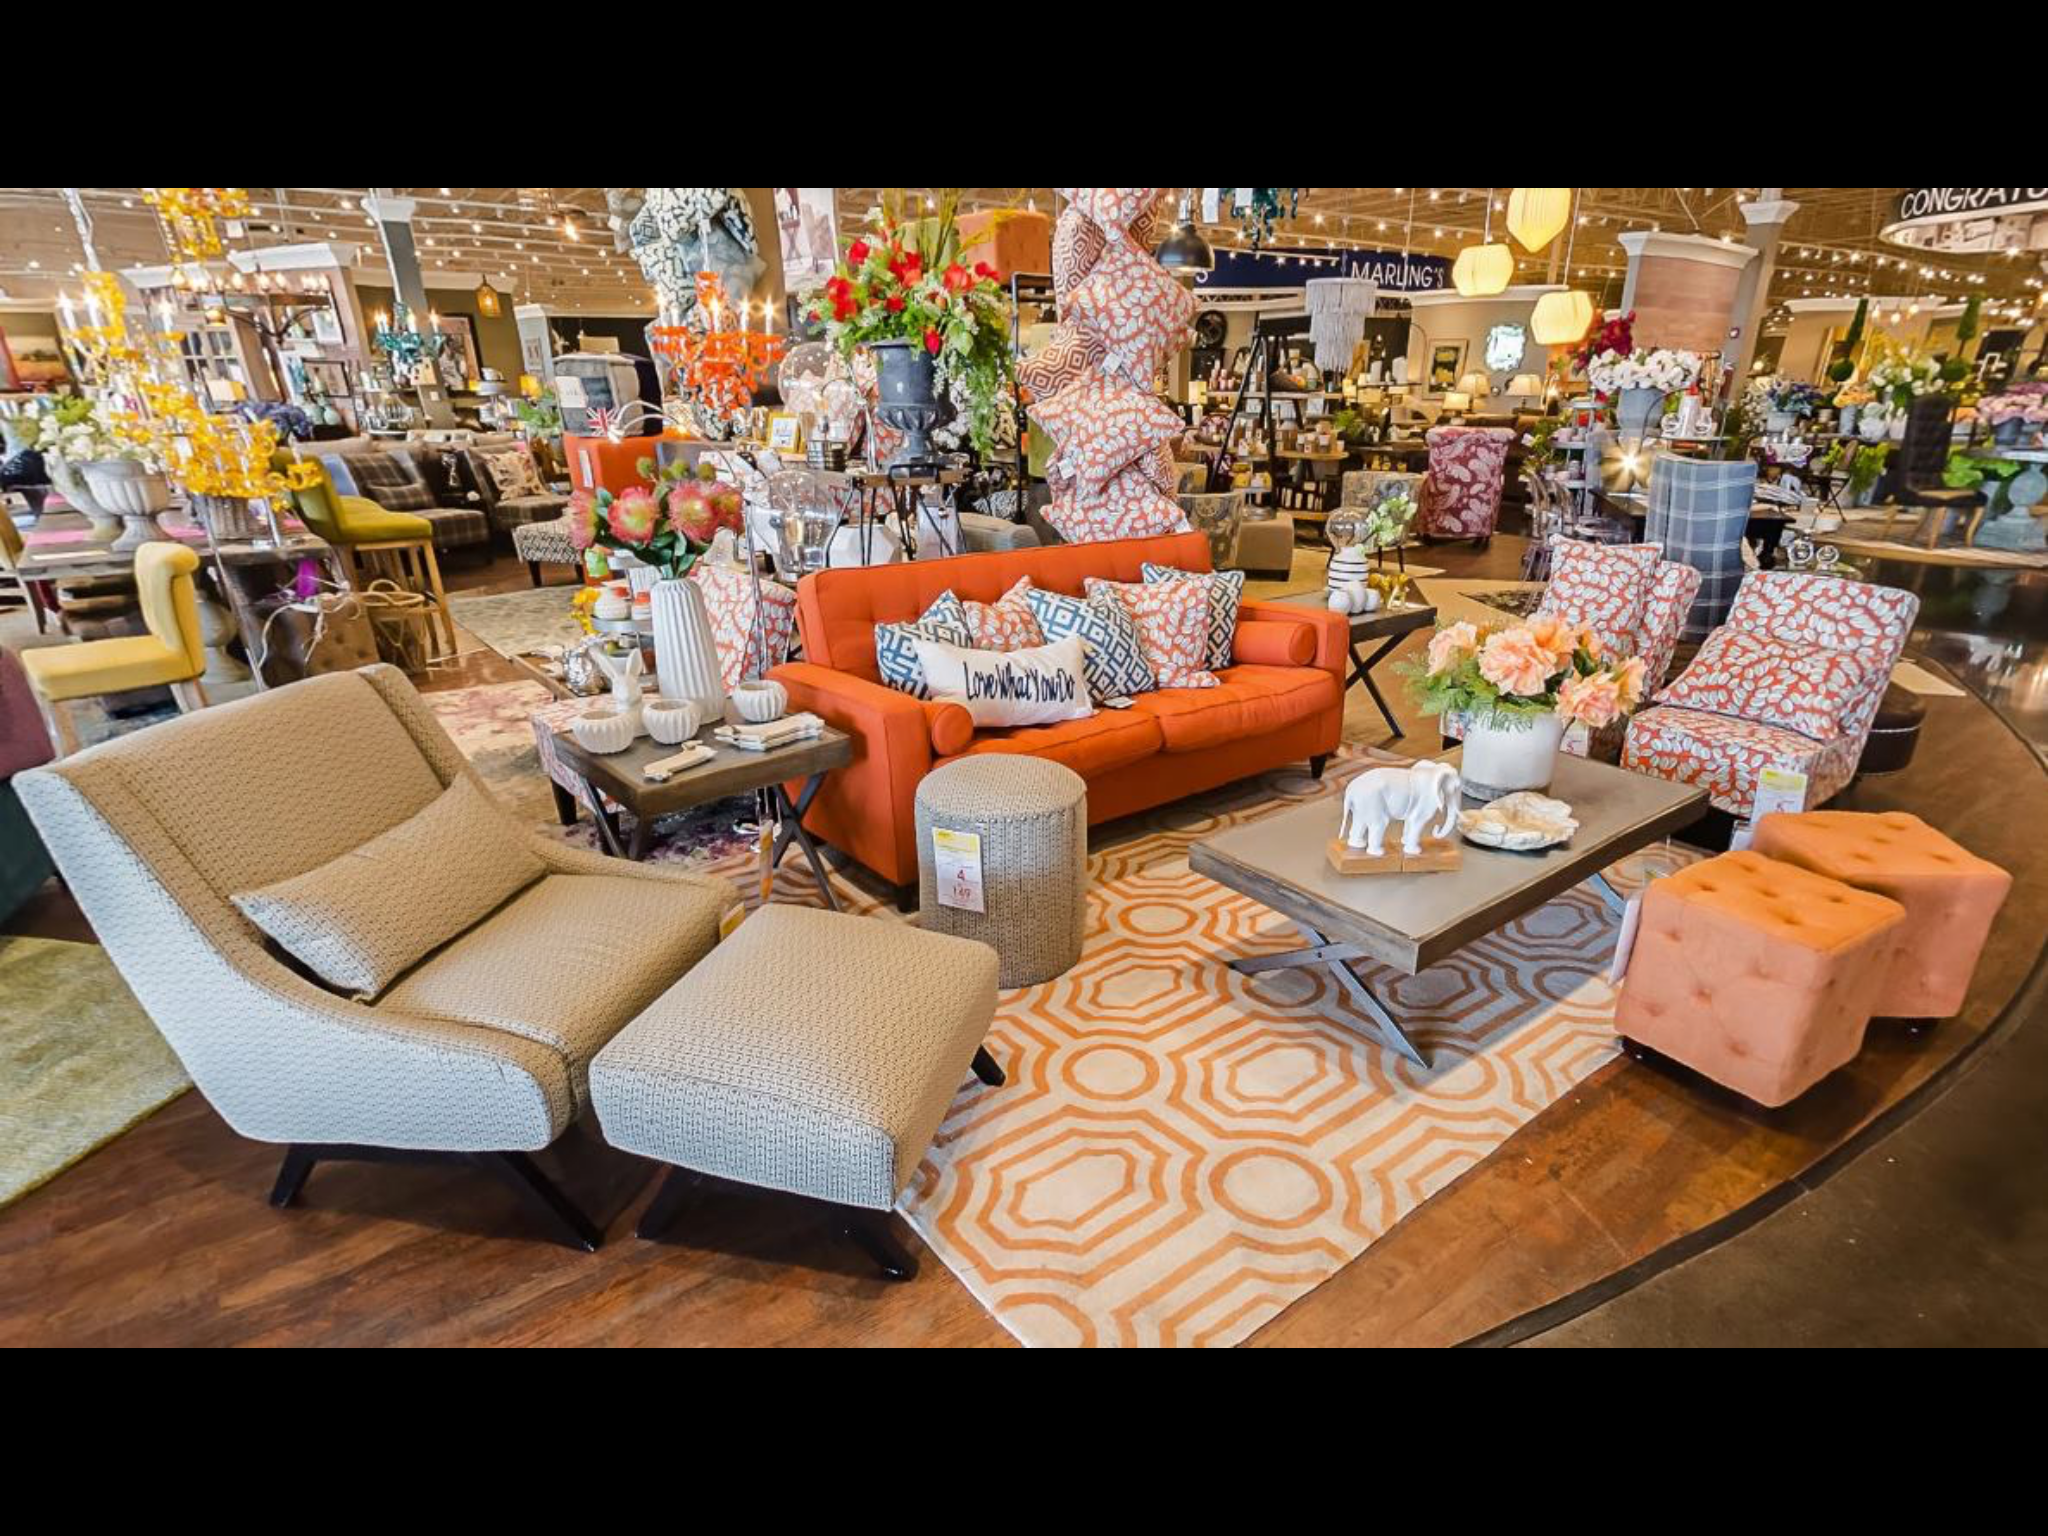 Amazing Angelo Homes / Furniture Mall Of Kansas